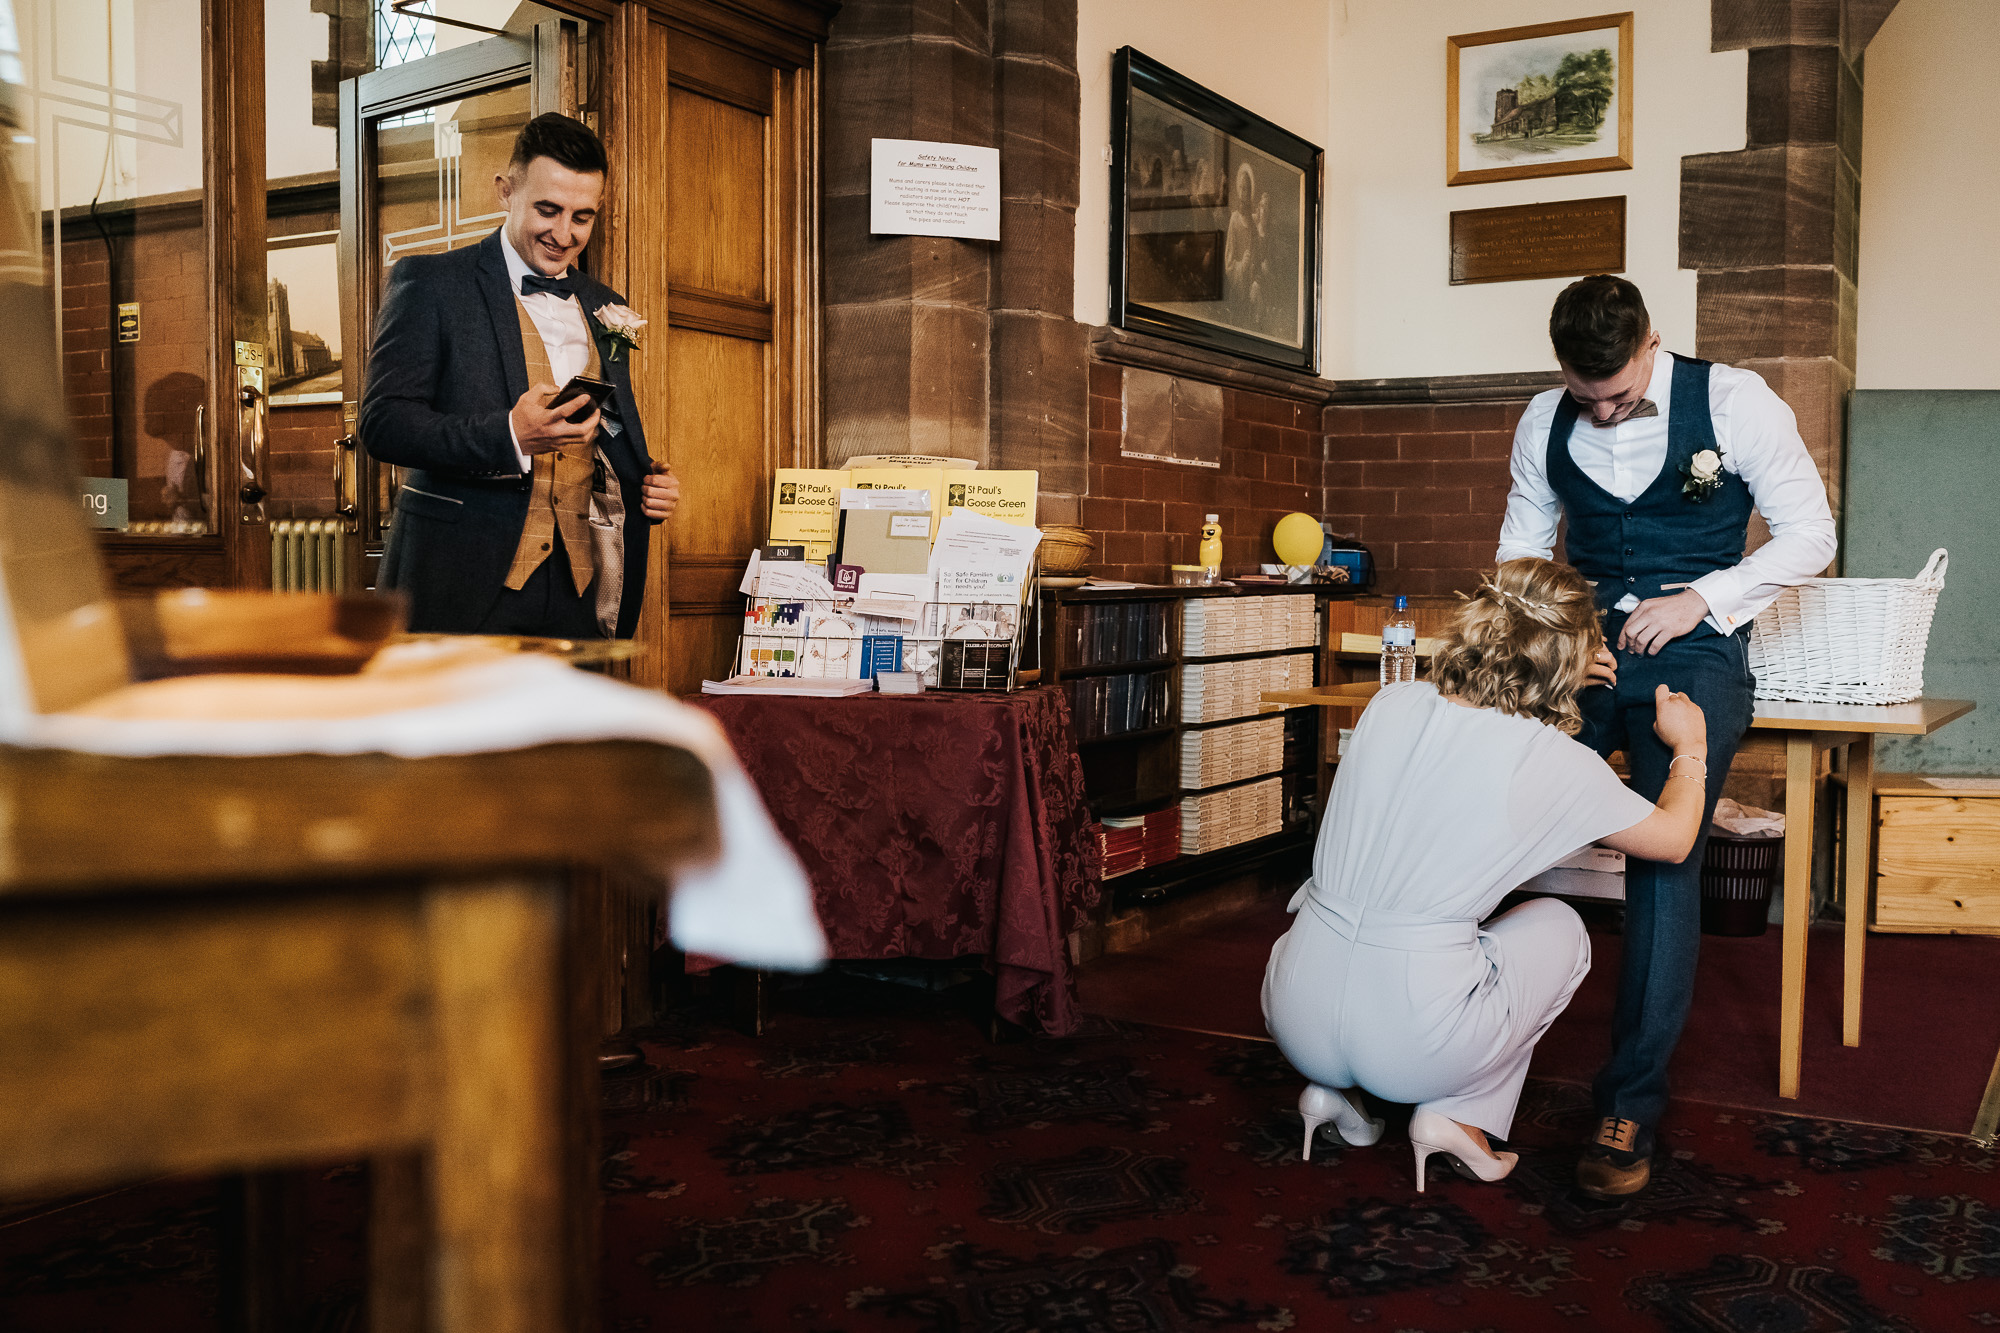 Rivington Hall Barn Wedding PHotographer lancashire wedding photography (6 of 34).jpg